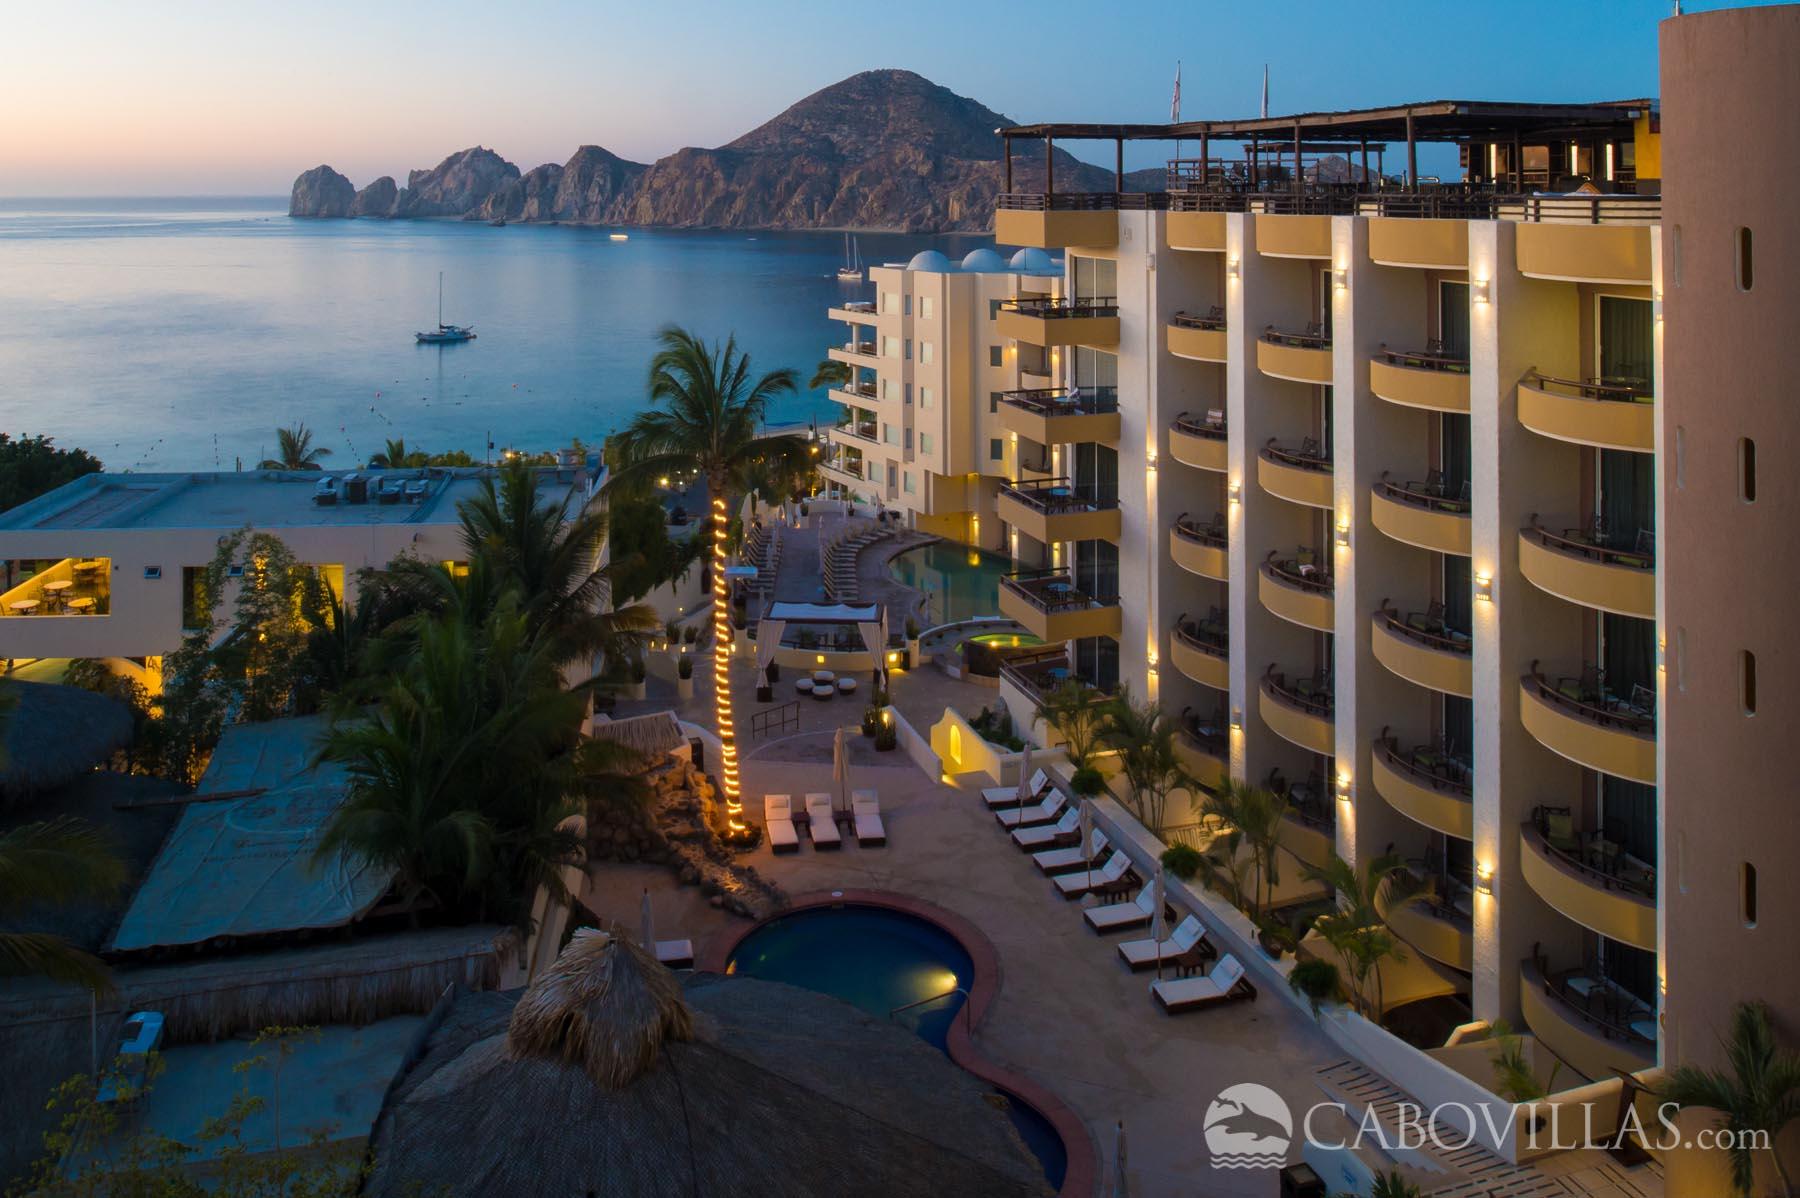 Cabo Villas Beach Resort 7022 Photo 1